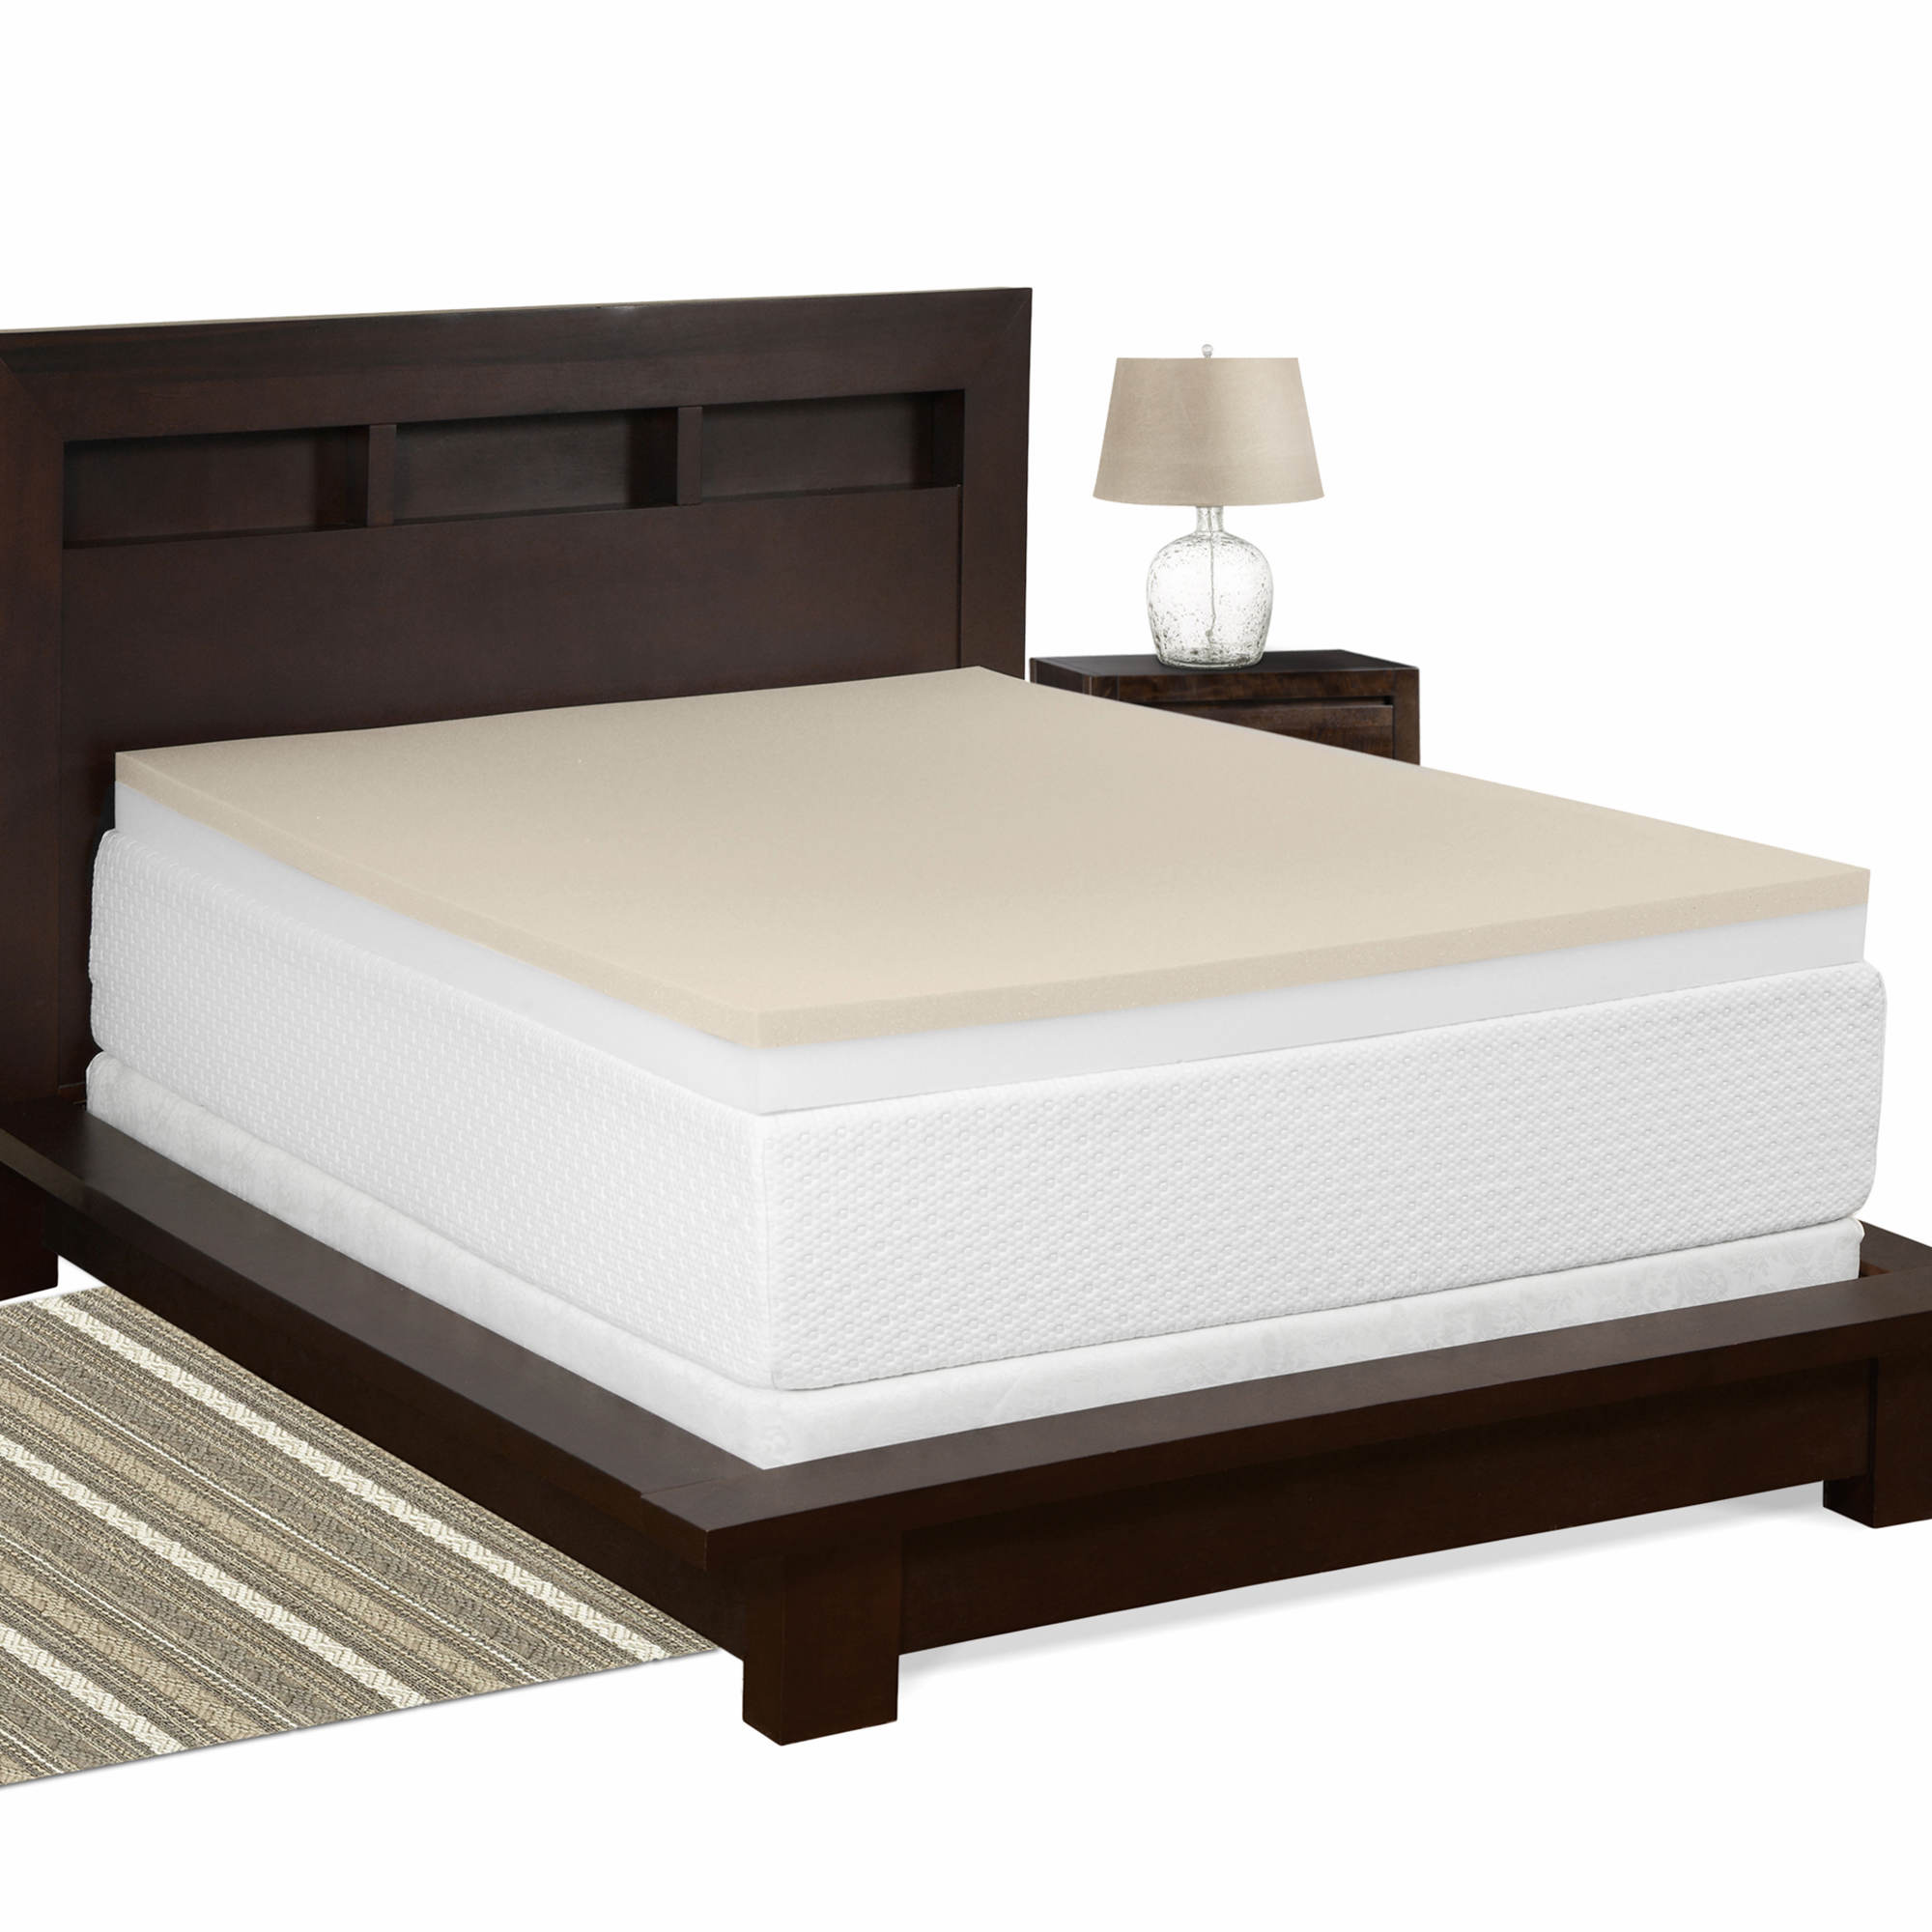 cradlesoft 4 dual layer memory foam queen size revitalizer plus mattress topper bj 39 s. Black Bedroom Furniture Sets. Home Design Ideas